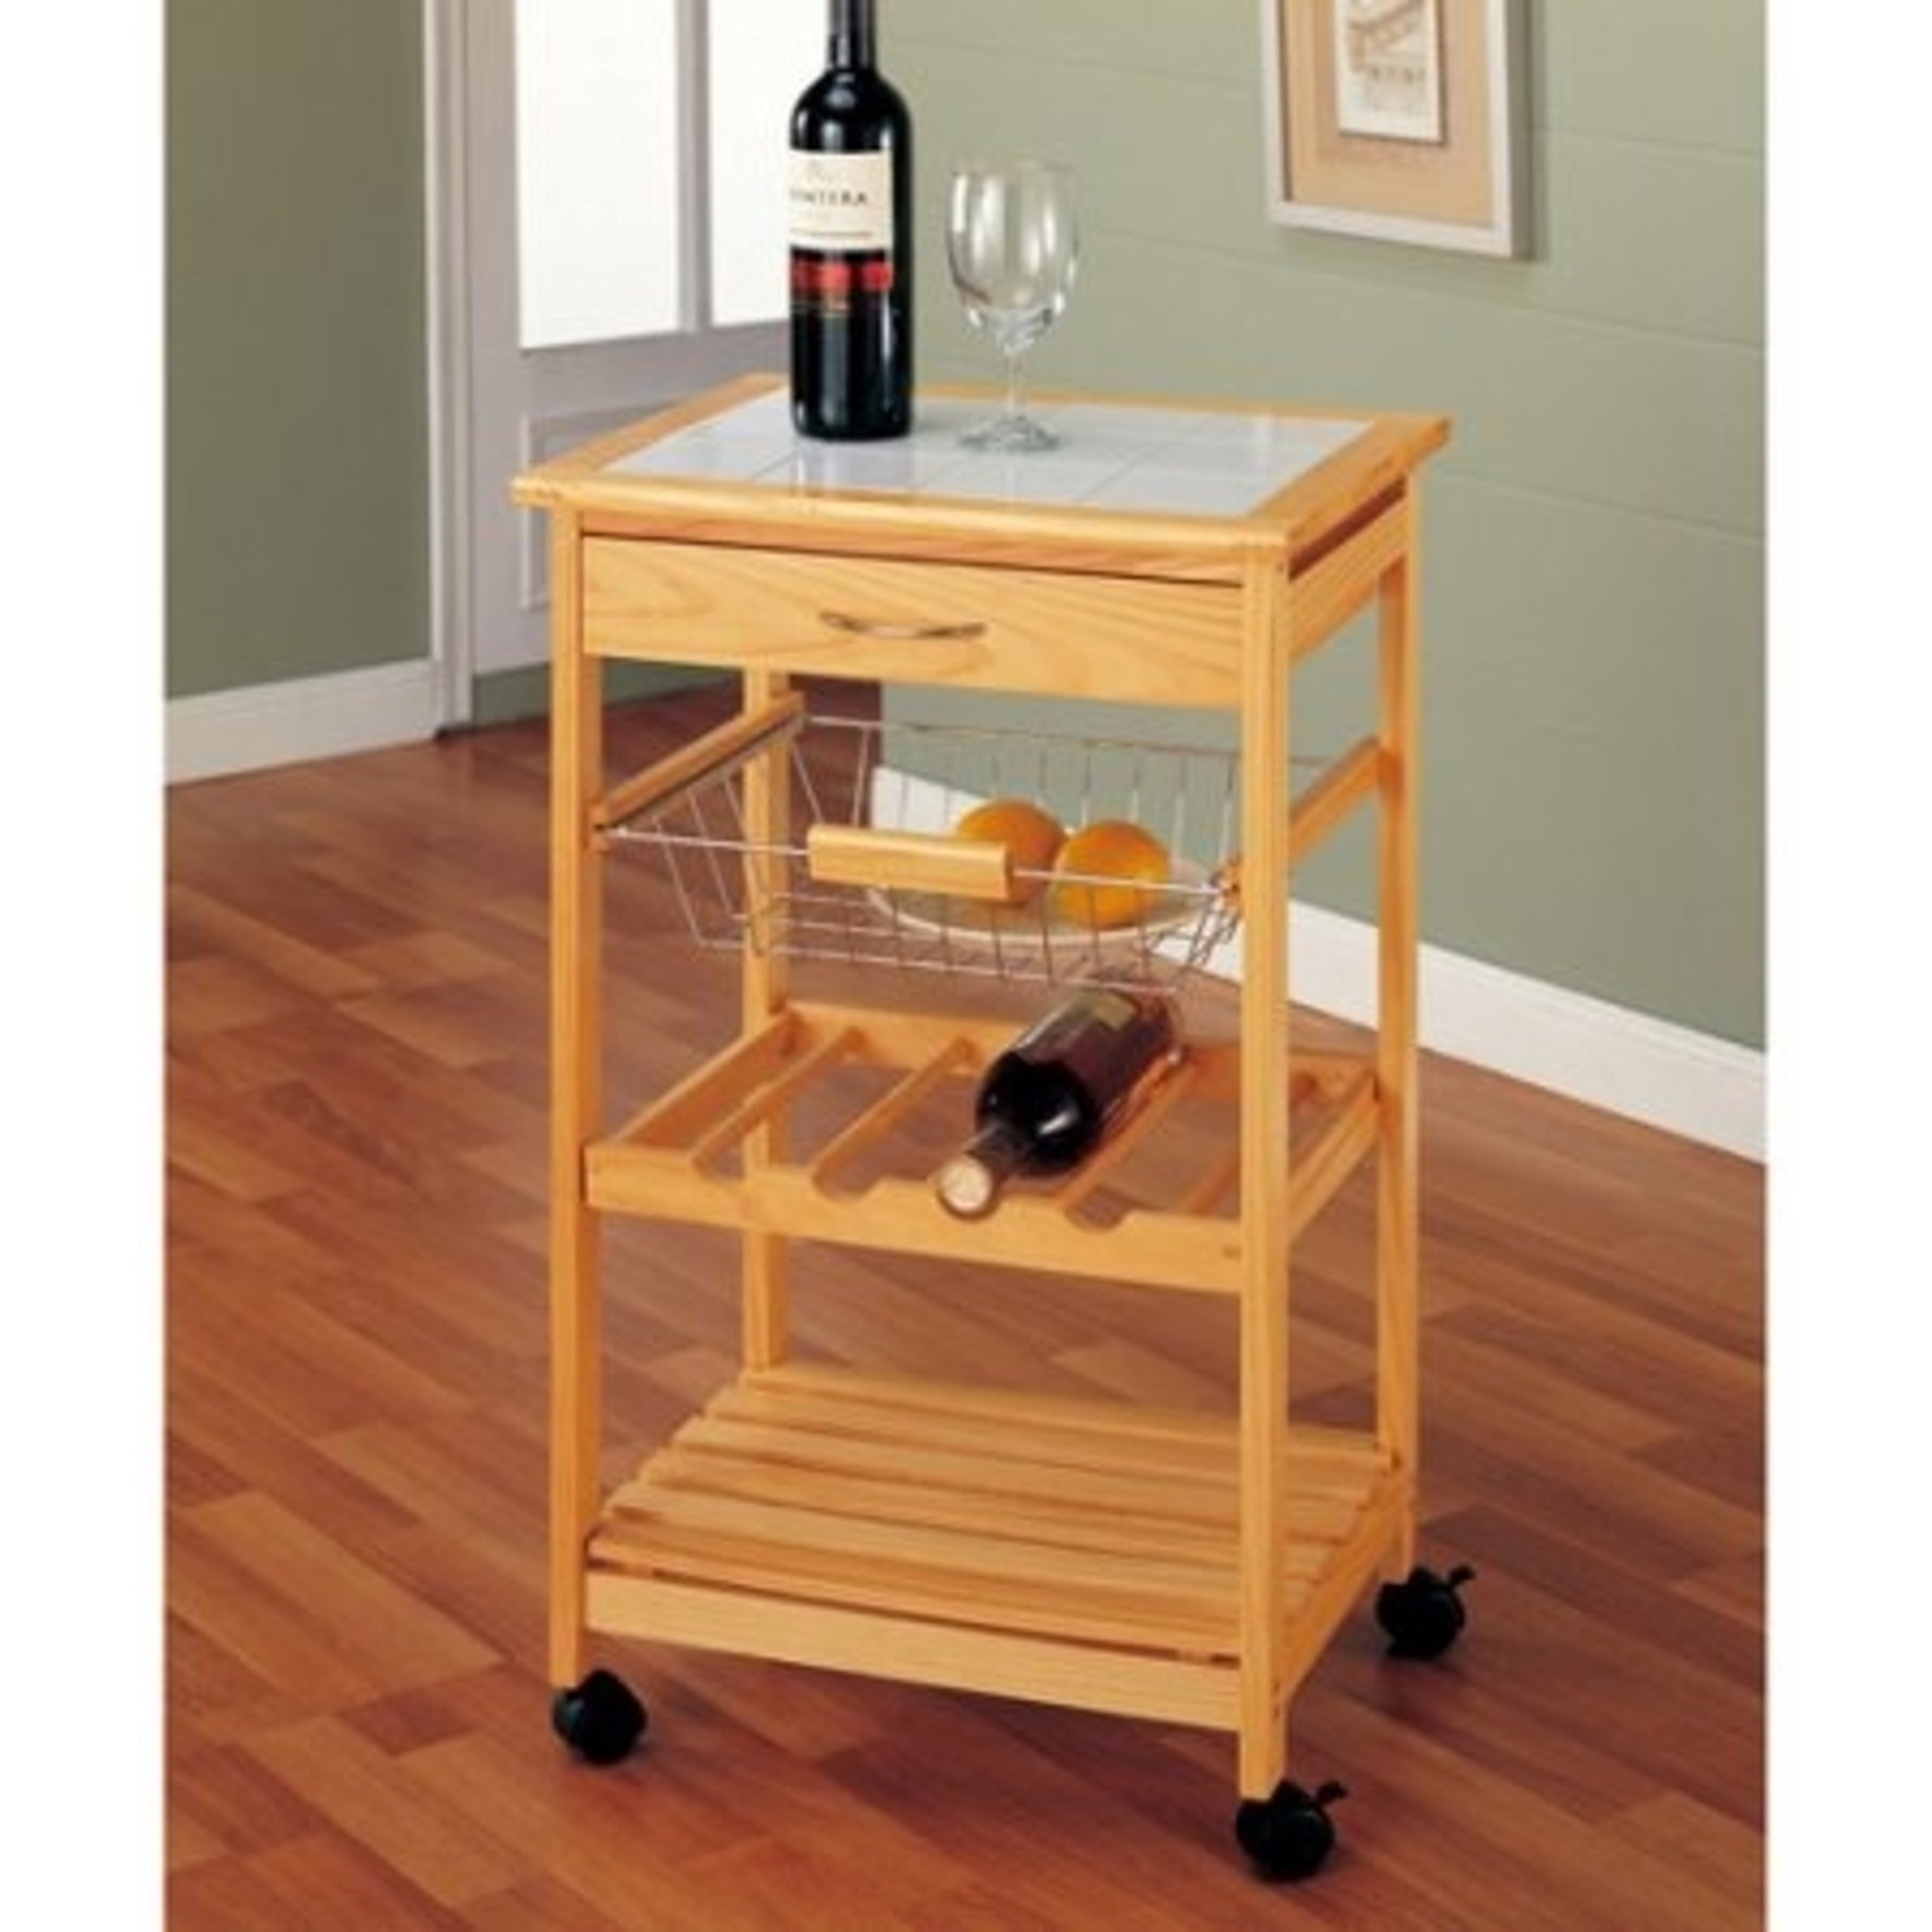 Elegant Design Wine Rack Kitchen Cart with Sturdy Metal Wire Basket